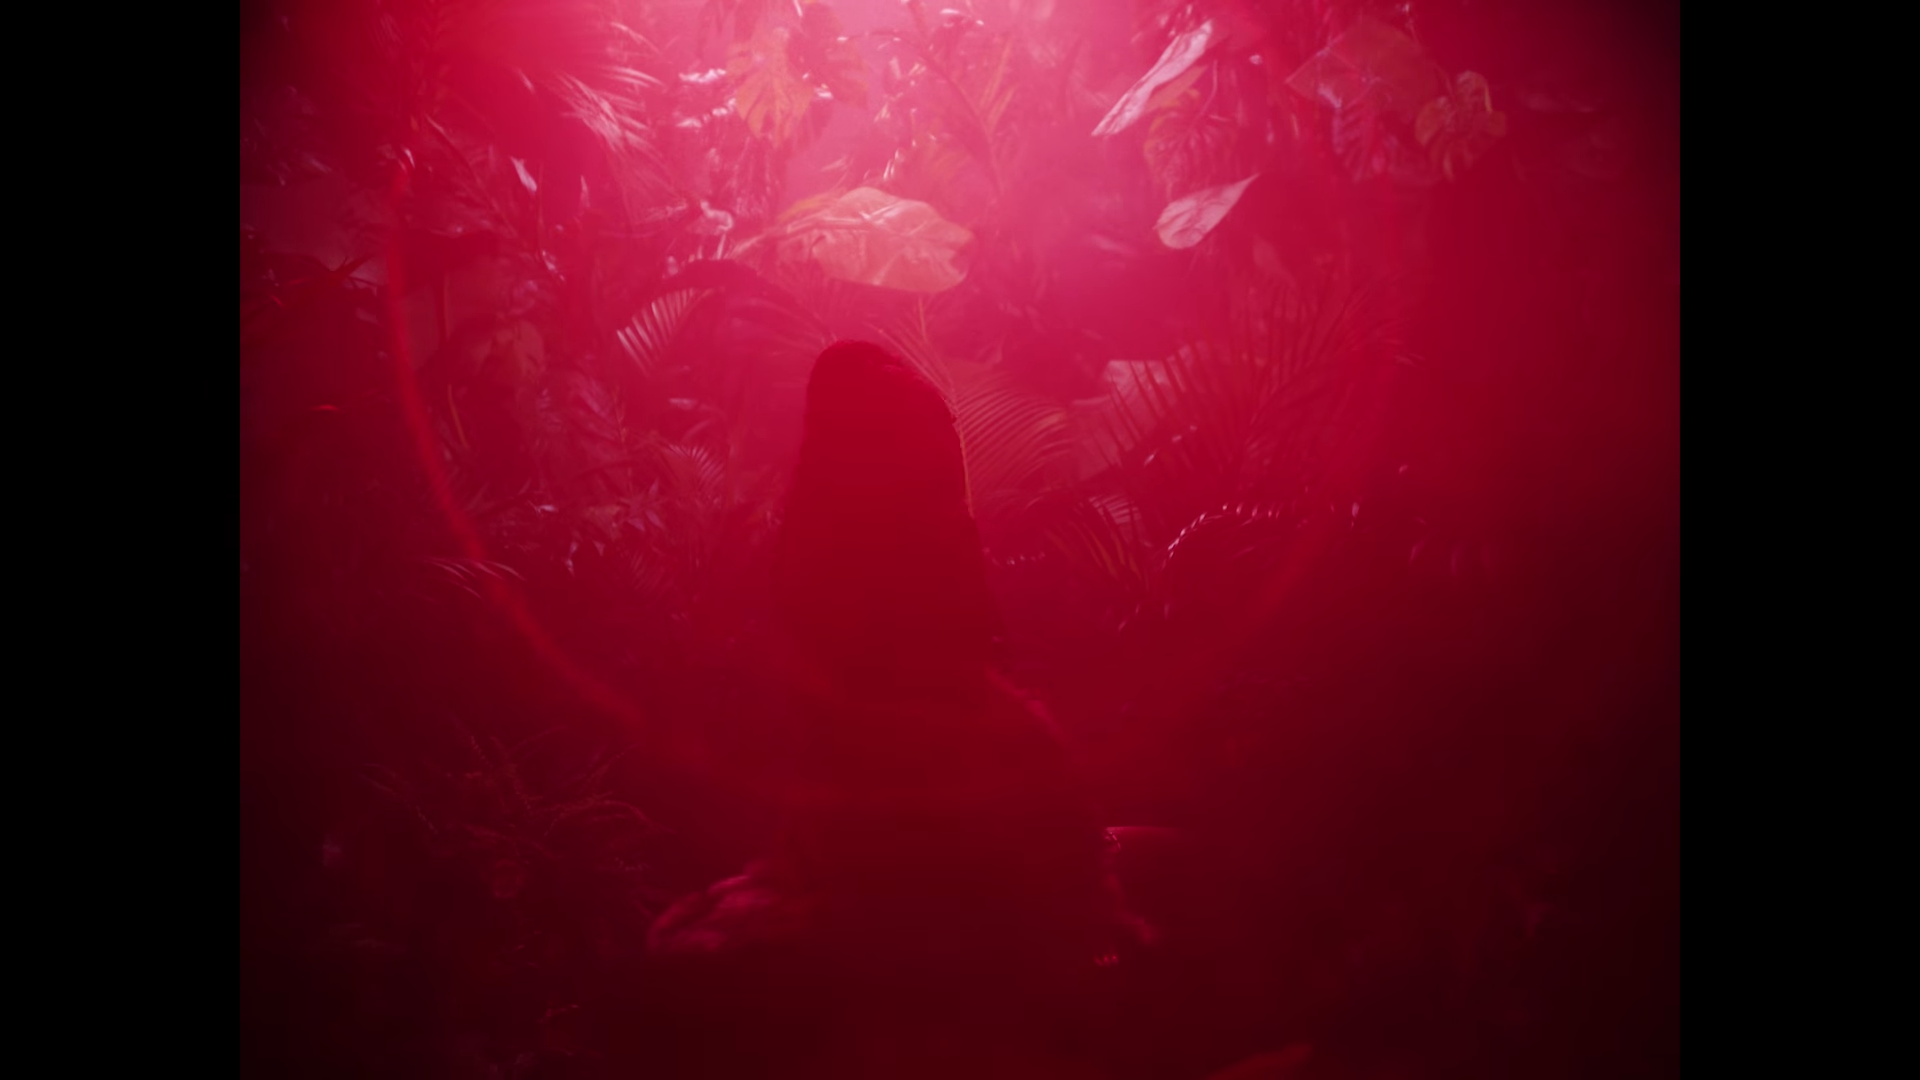 Popcaan - Body So Good (Official Video) 0-49 screenshot